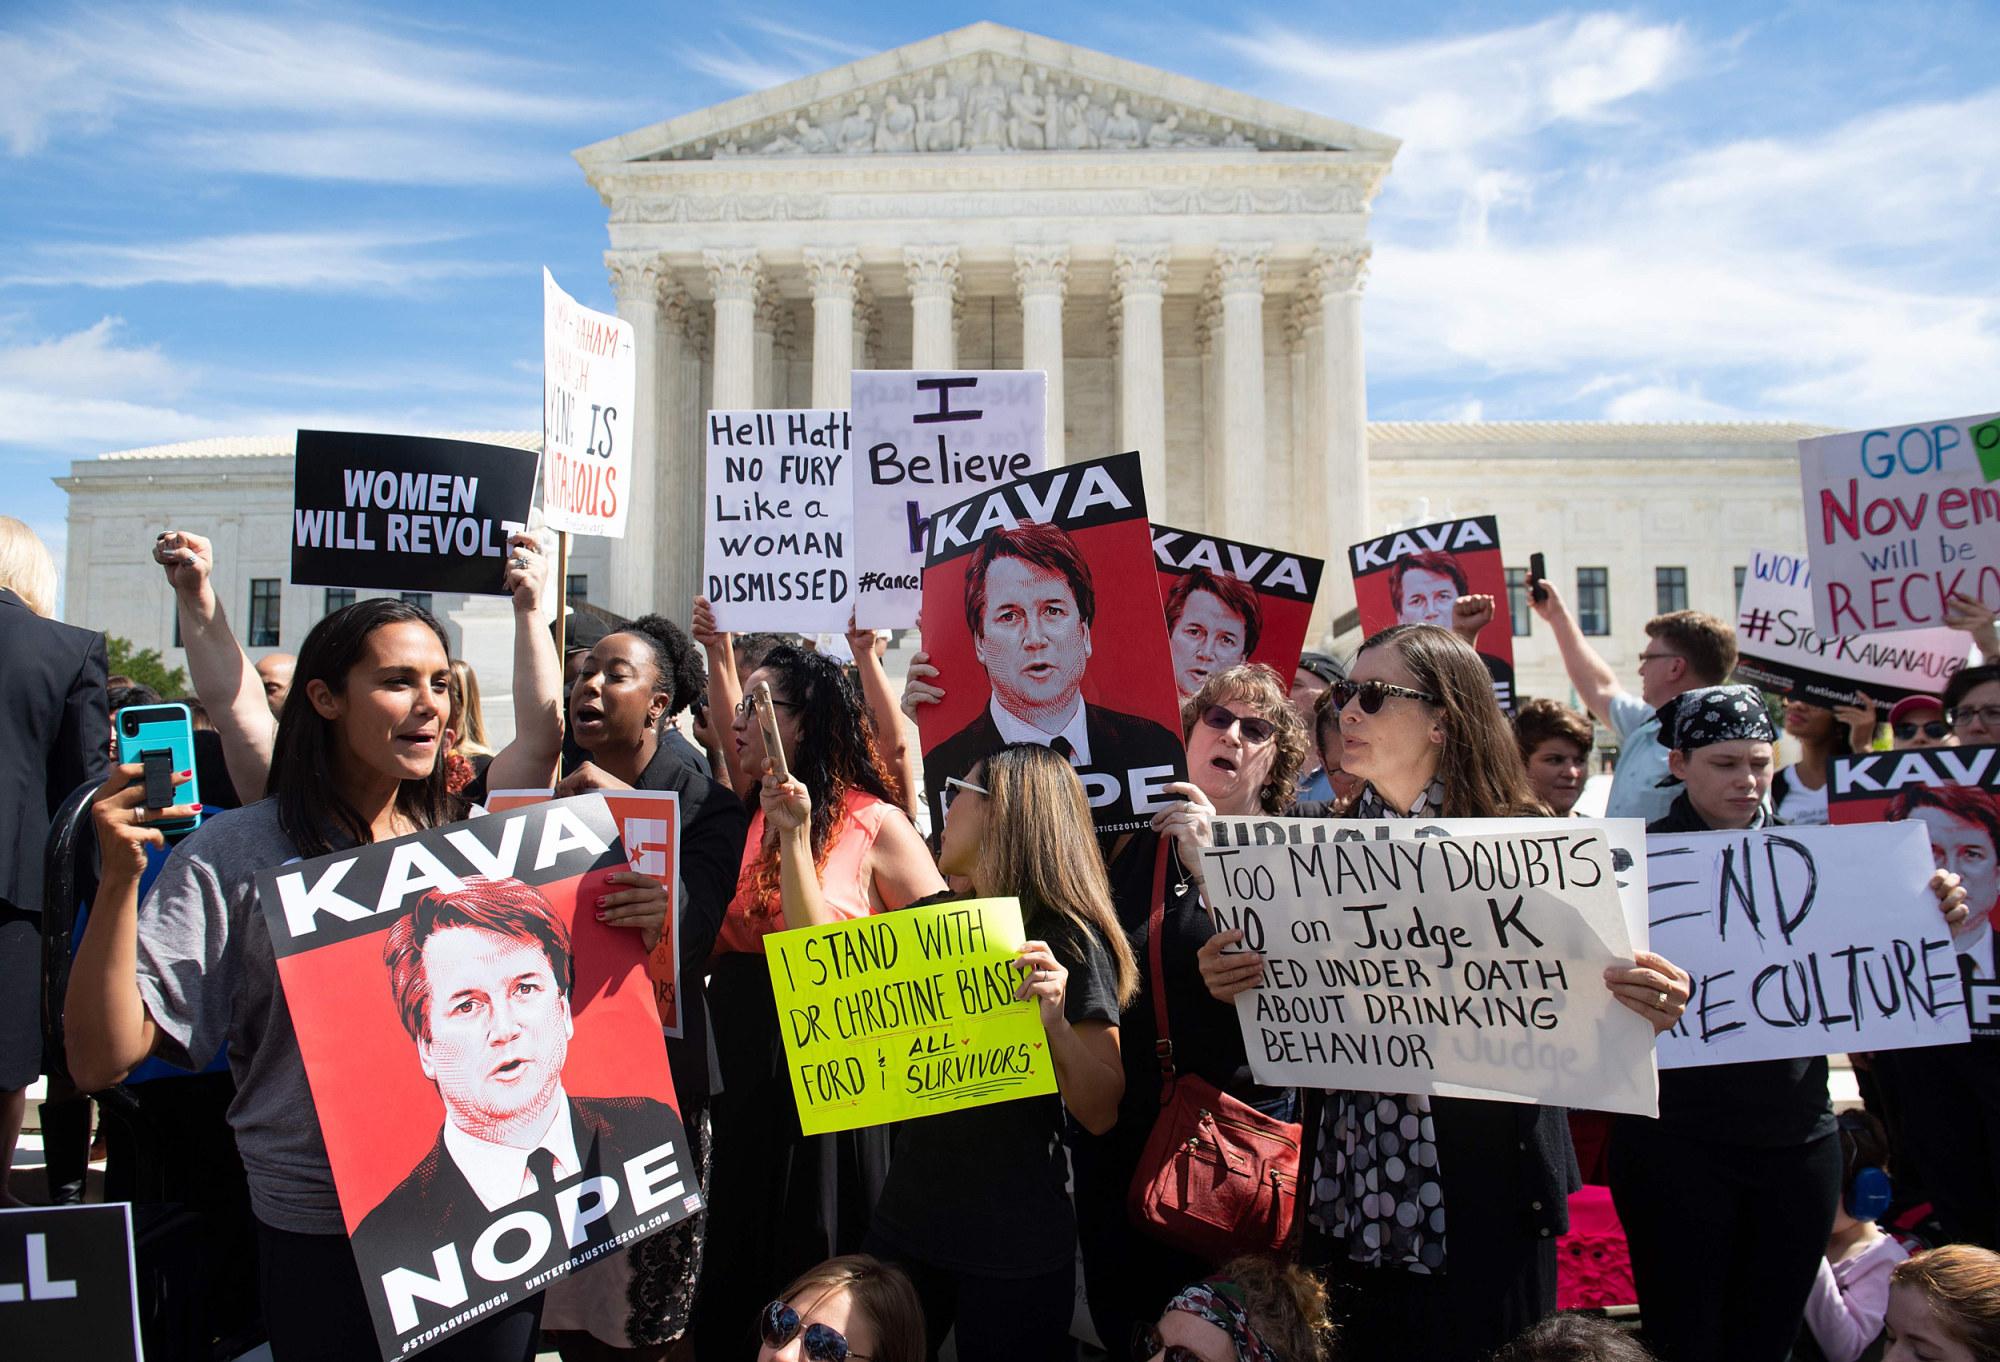 180928-kavanaugh-protest-supreme-court-ew-103p_7ebe0d8e8d5cde14c30080e1e3c8a923.fit-2000w.jpg